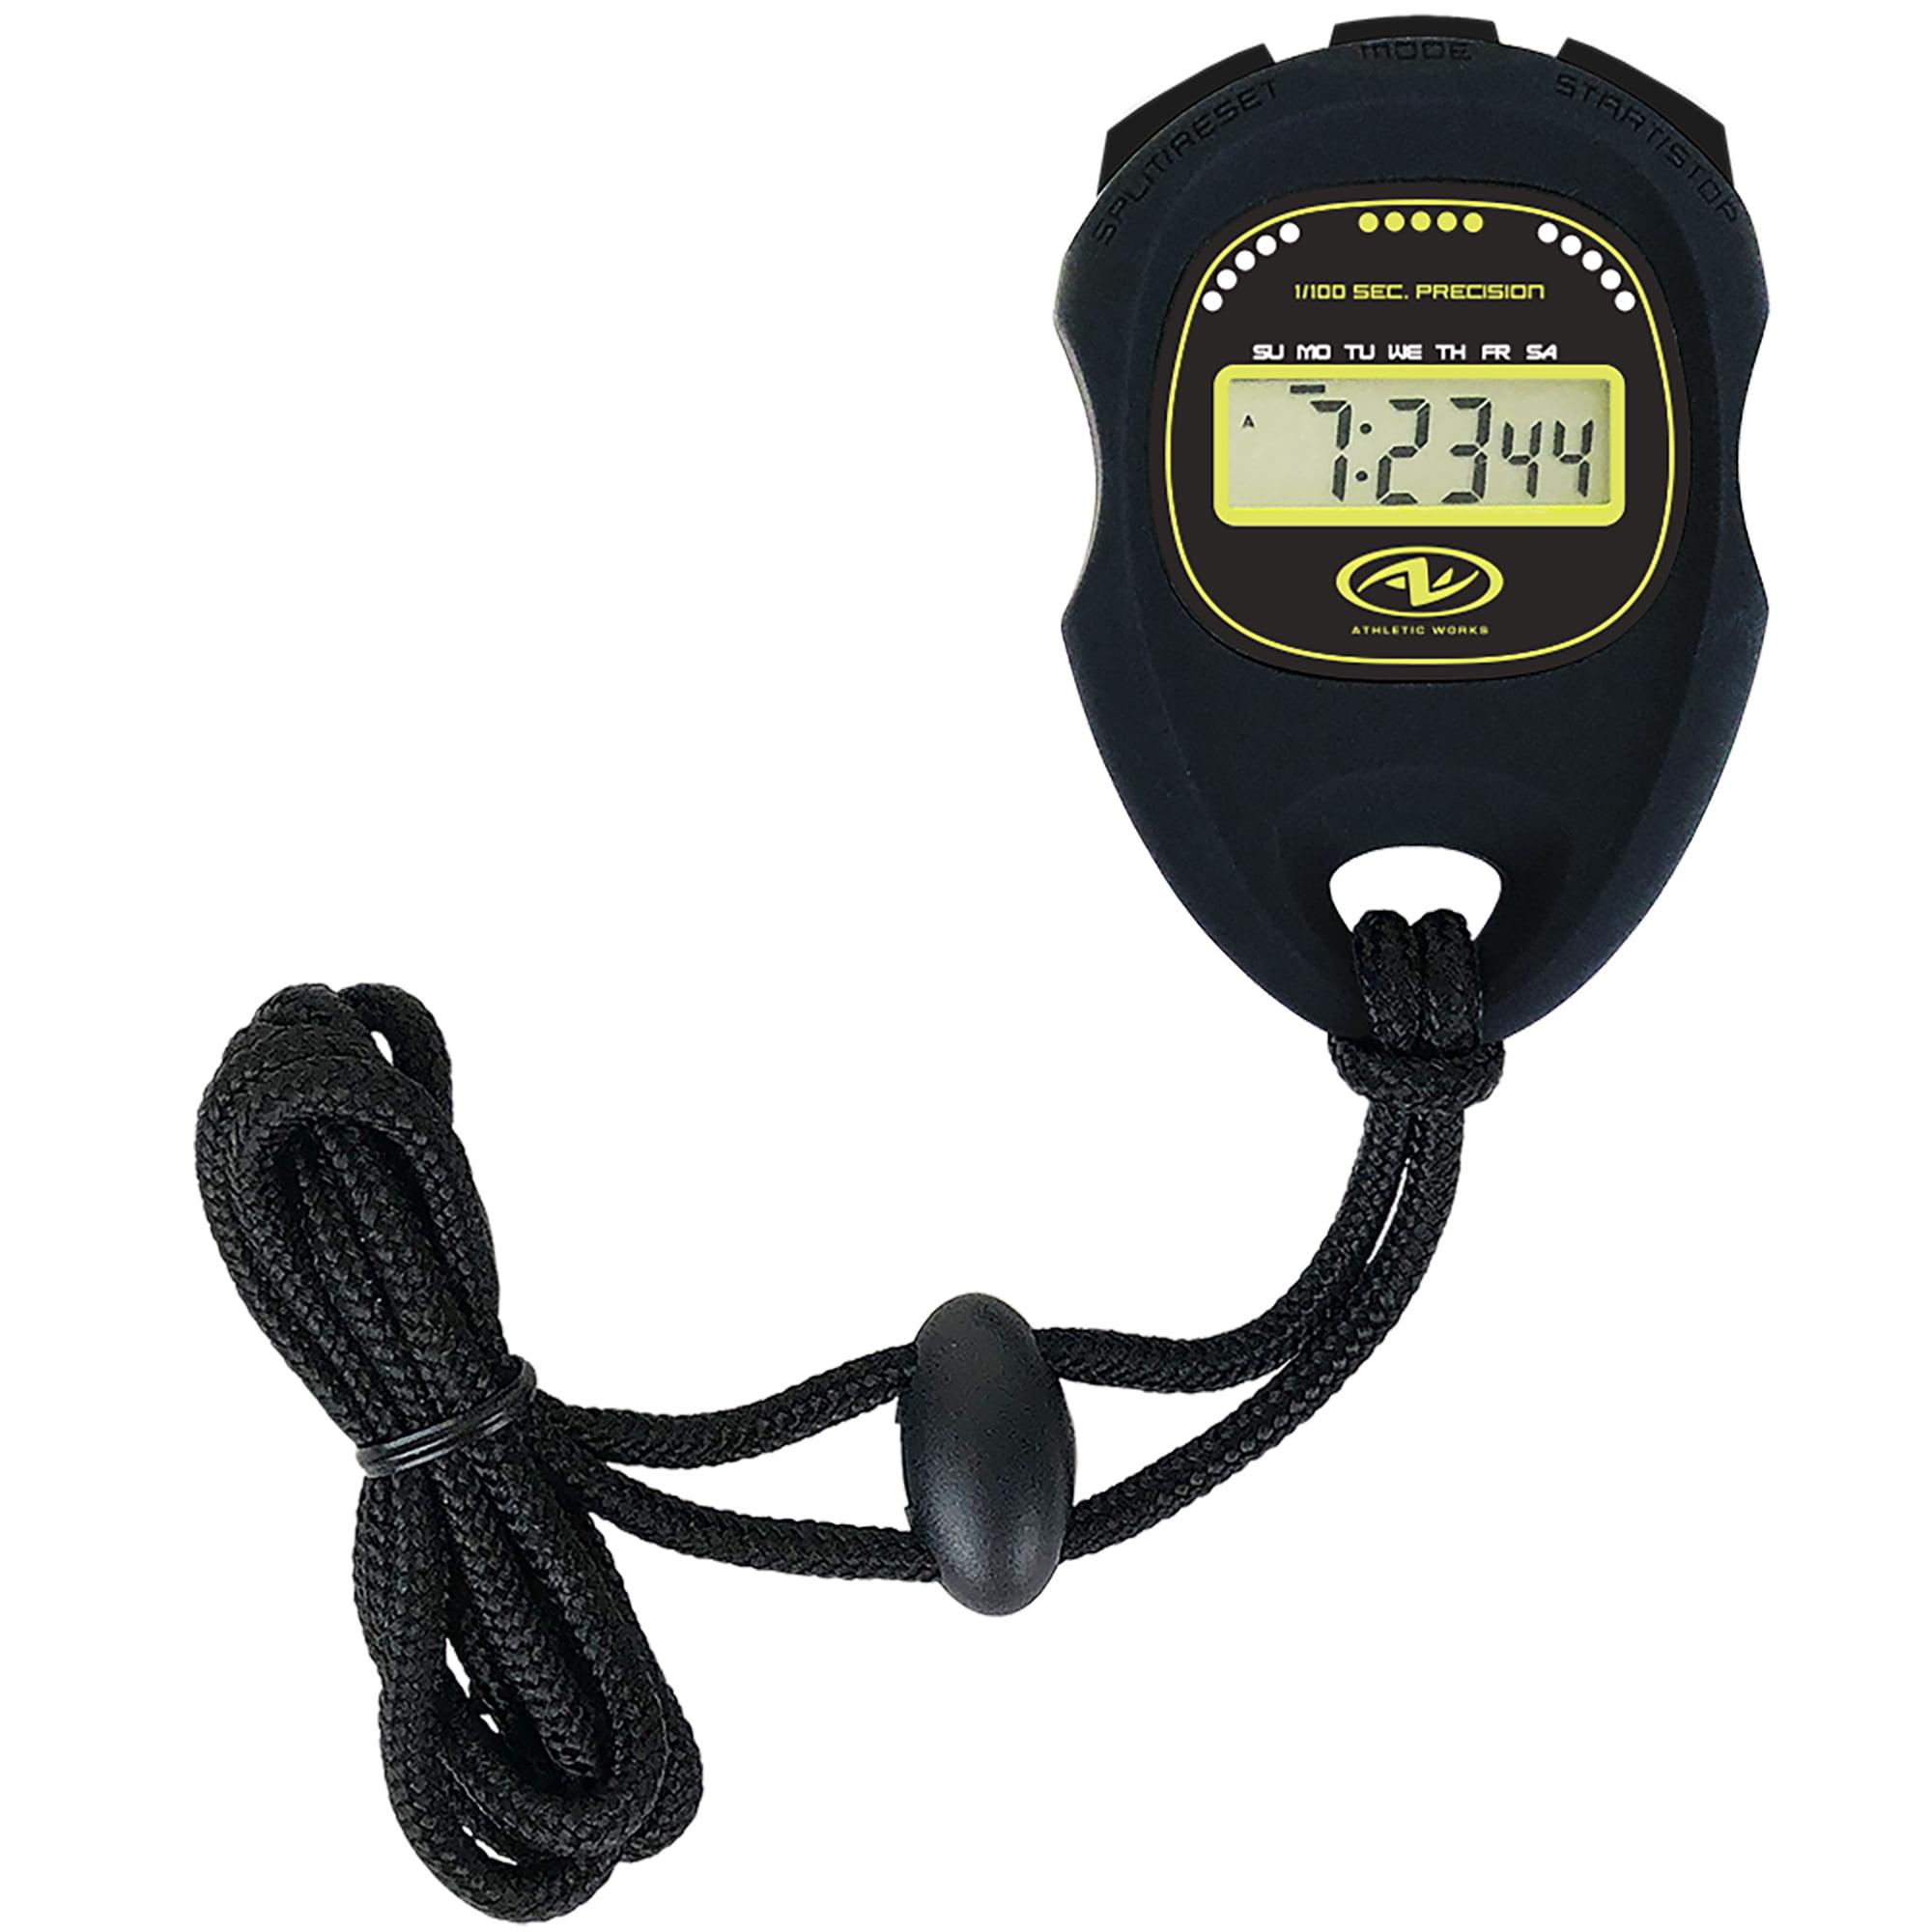 Athletic Works Digital Stopwatch